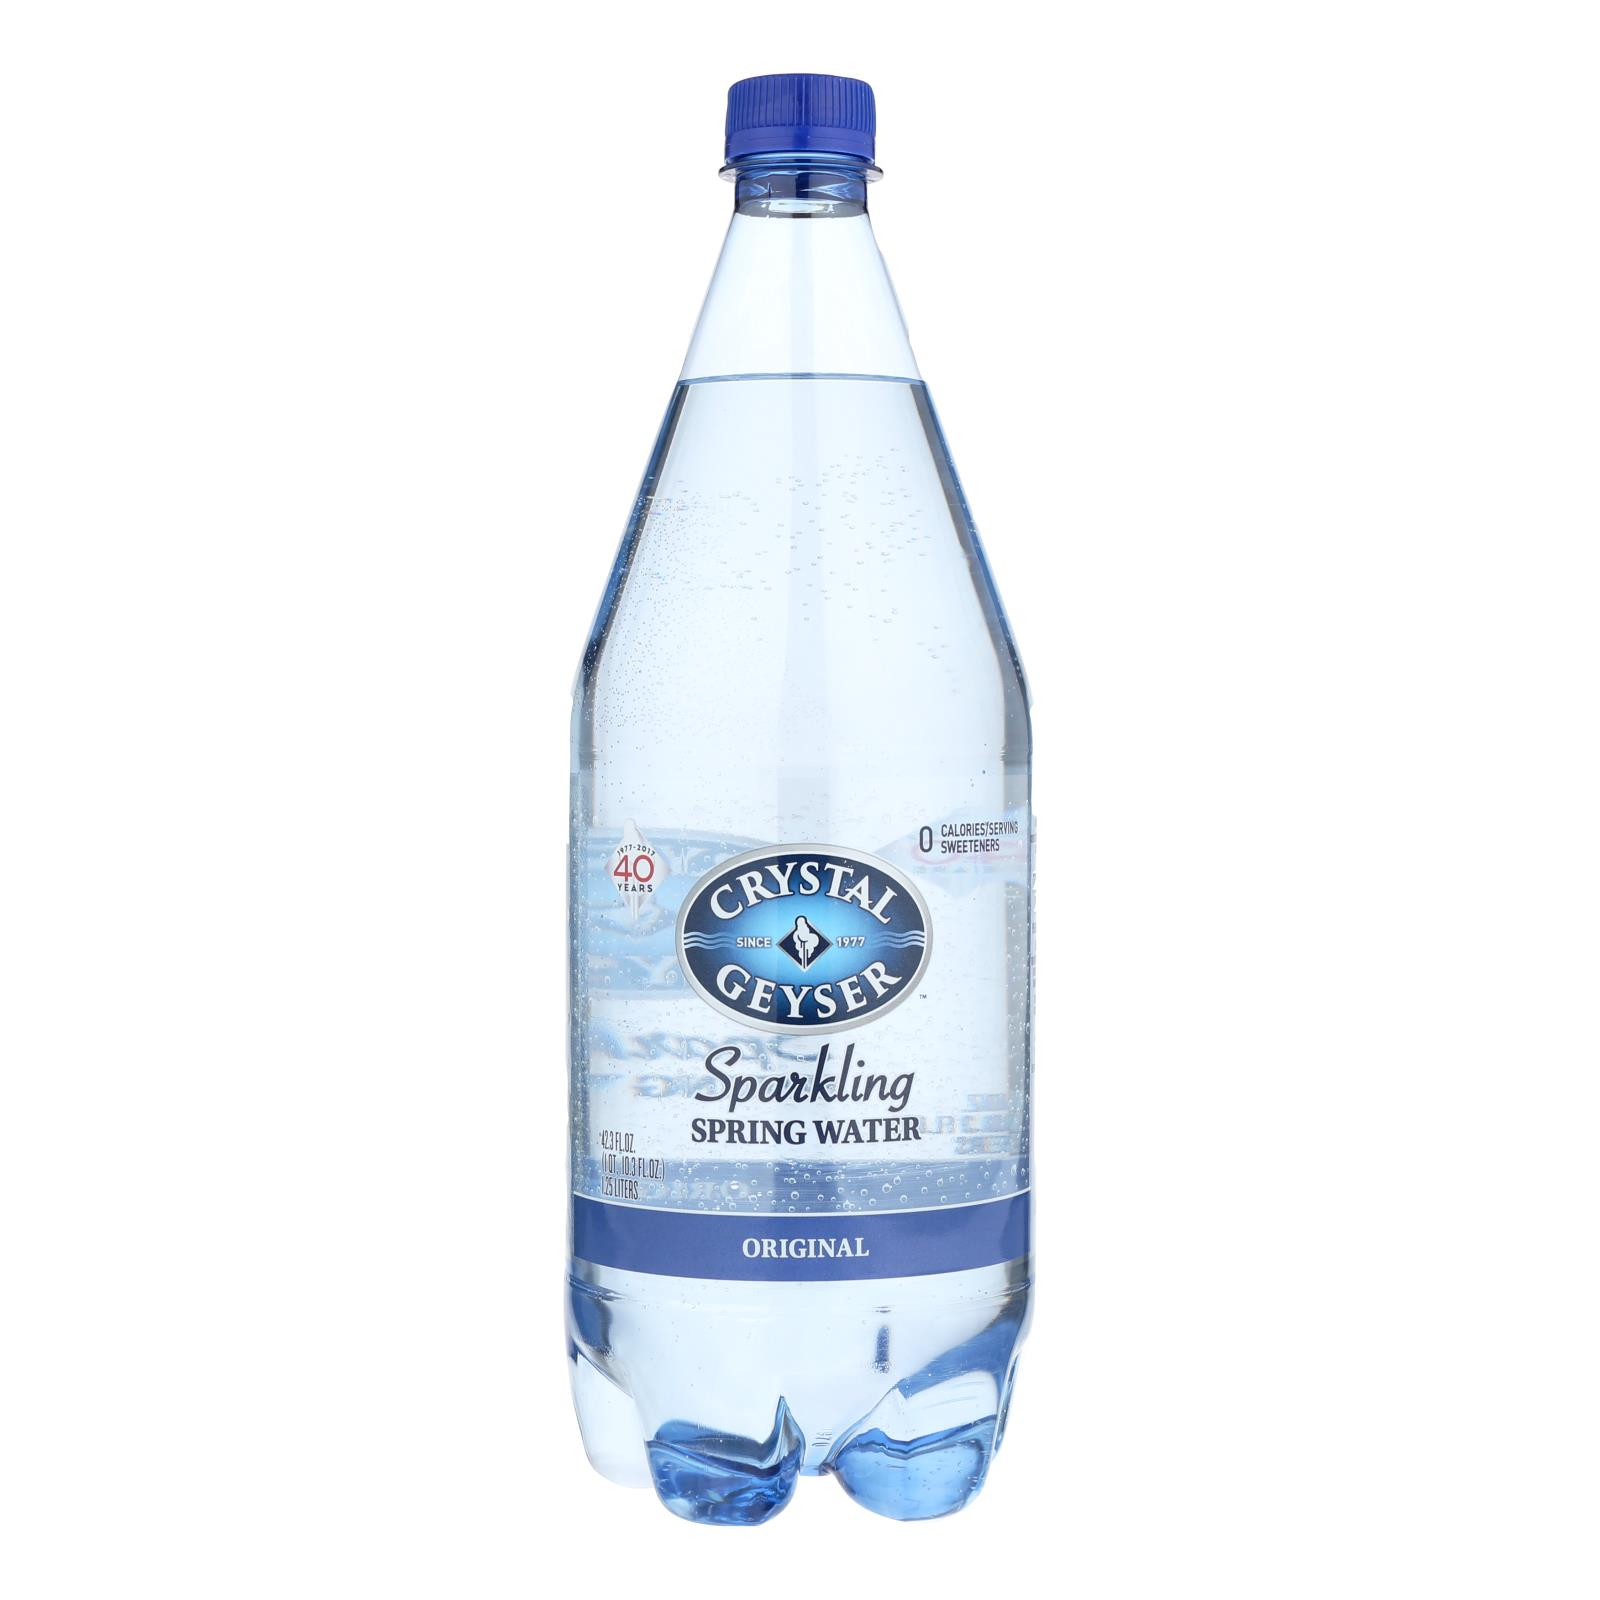 Crystal Geyser Sparkling Mineral Water - Original - Case of 12 - 1.25 Liter